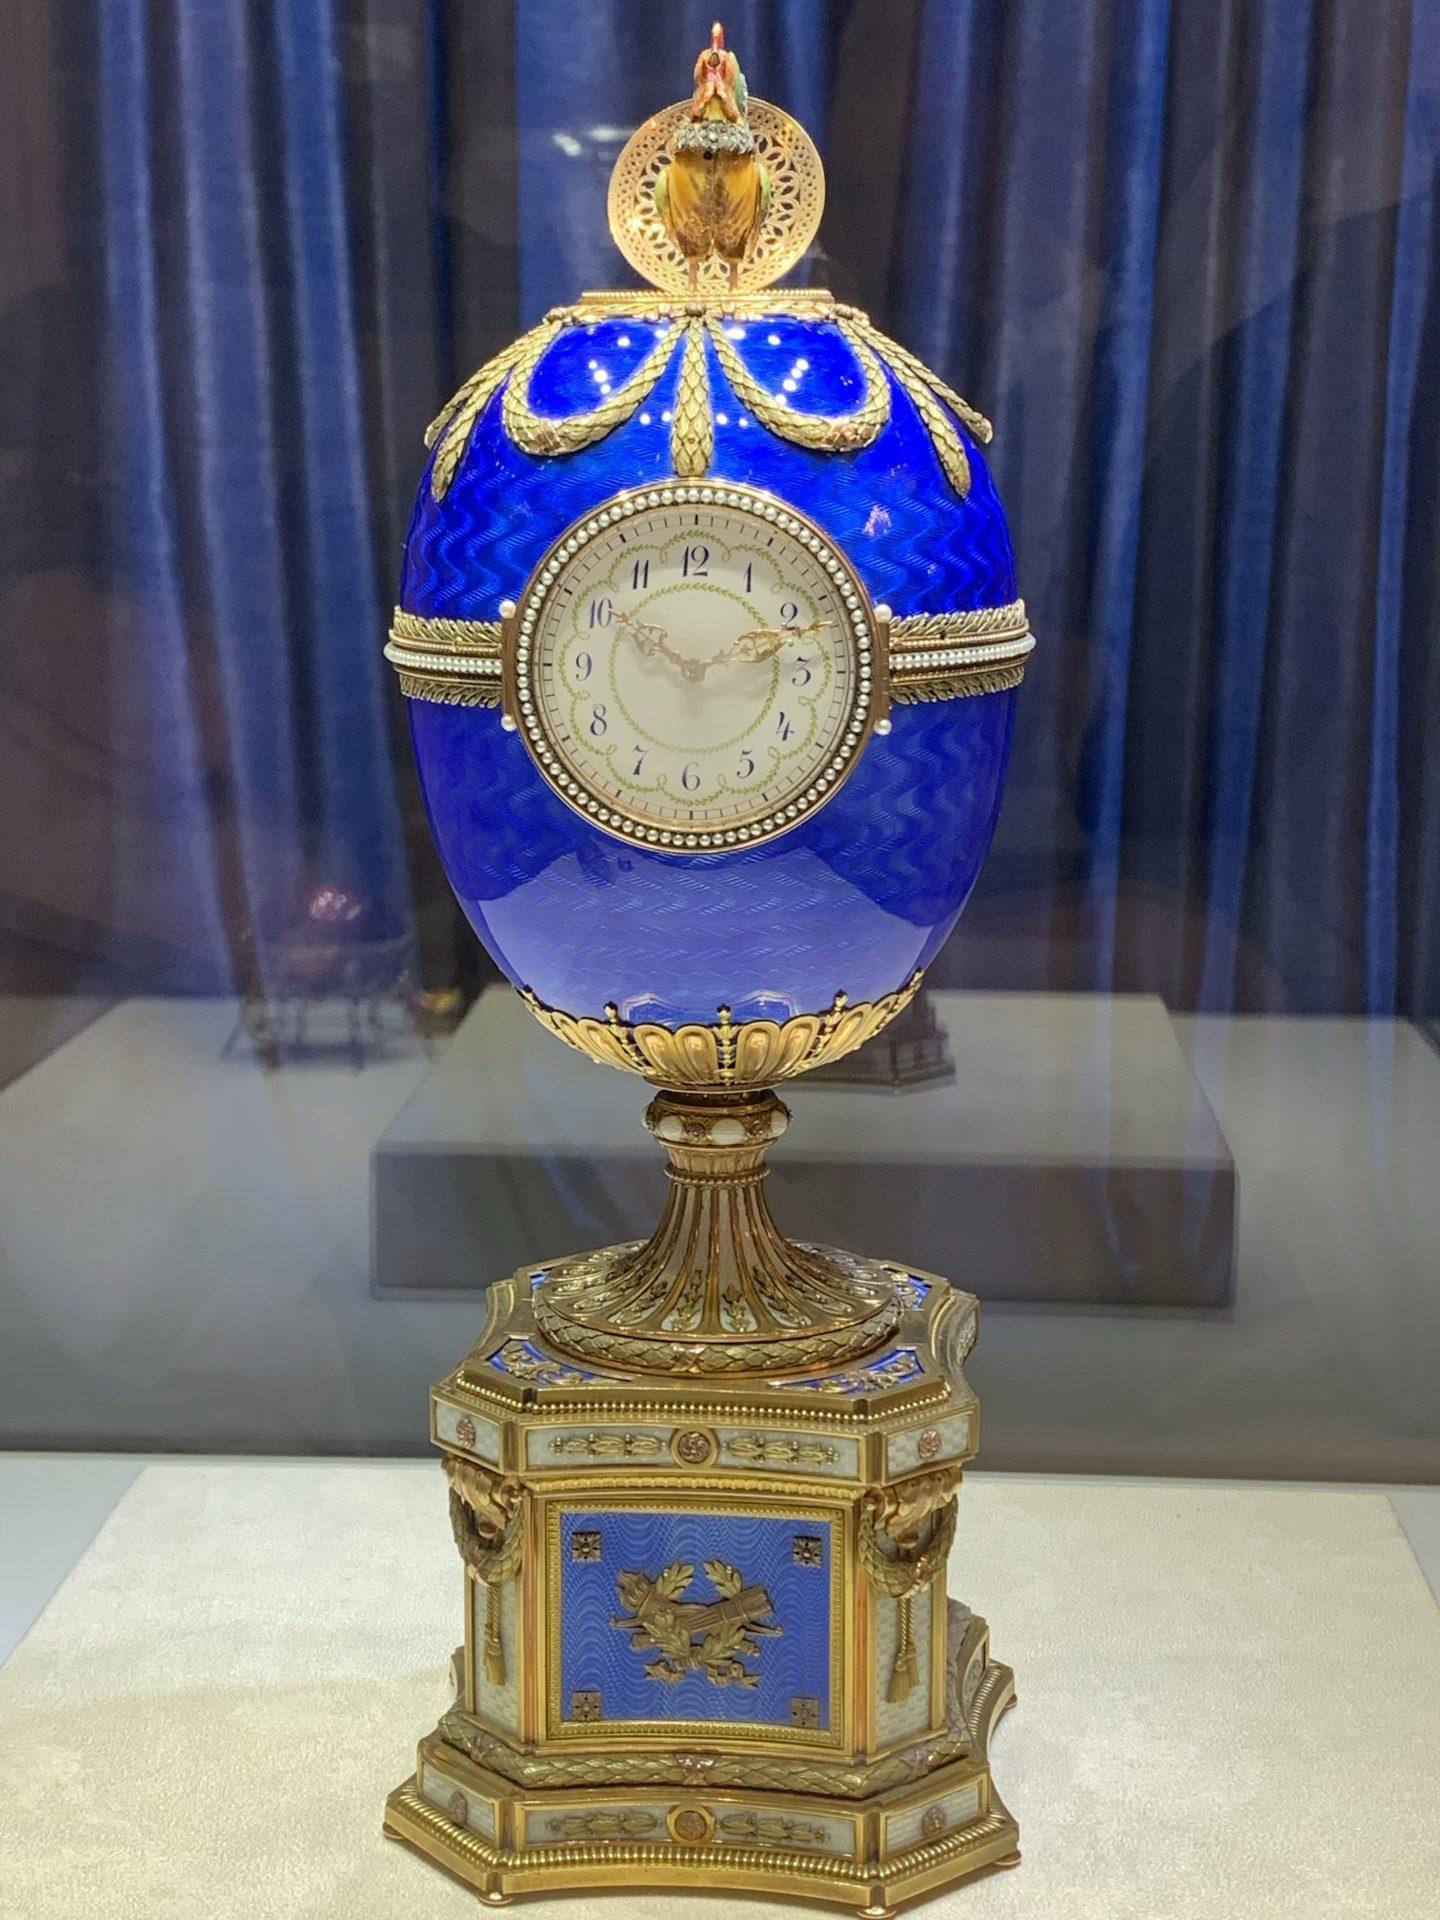 Chanticleer Fabergé Egg